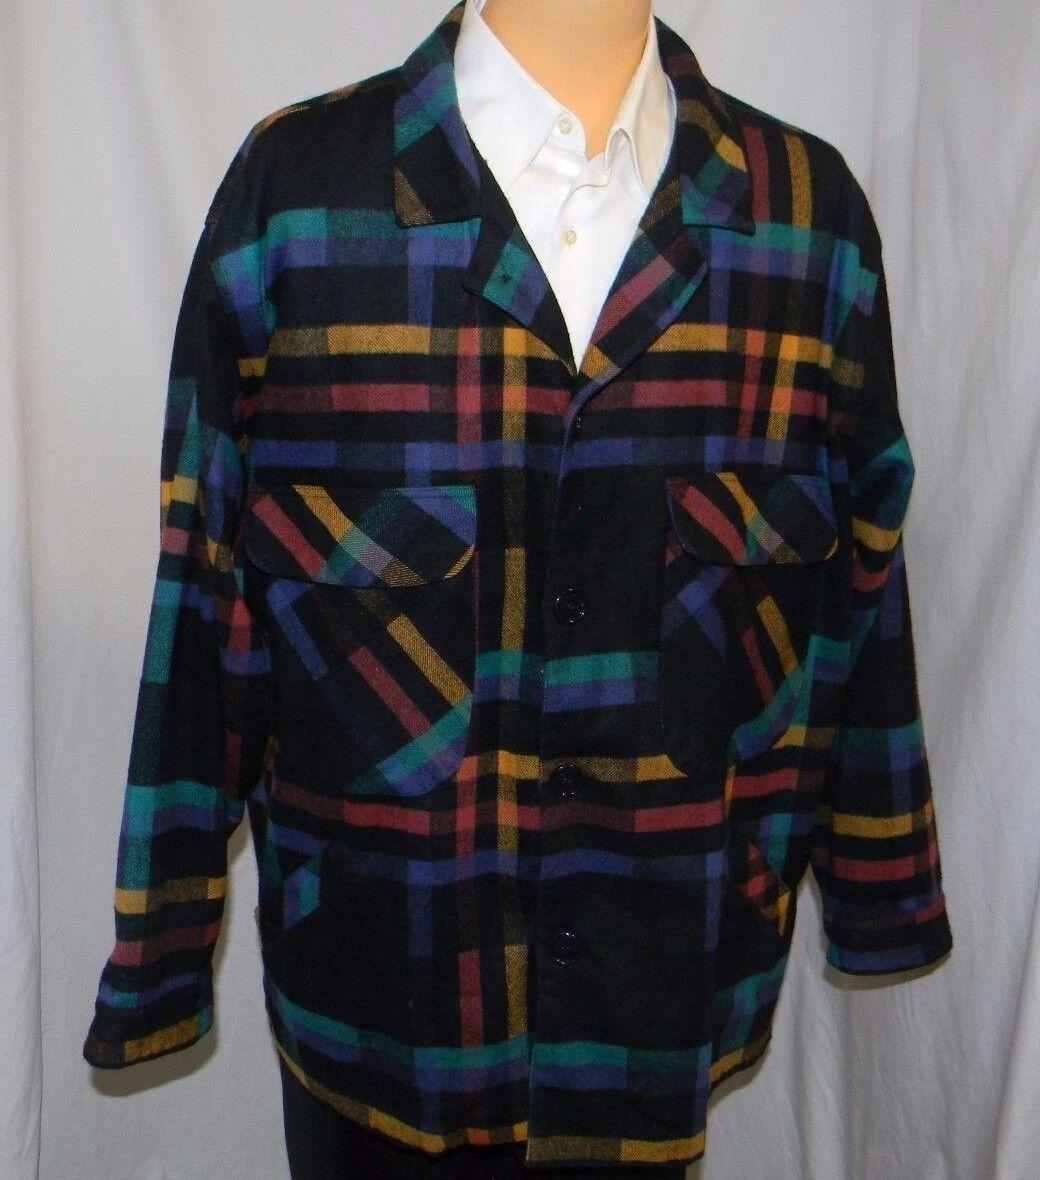 TDD at Format Wool Nylon Cashmere Flannel Blazer Sport Shirt USA 3XL XXXL